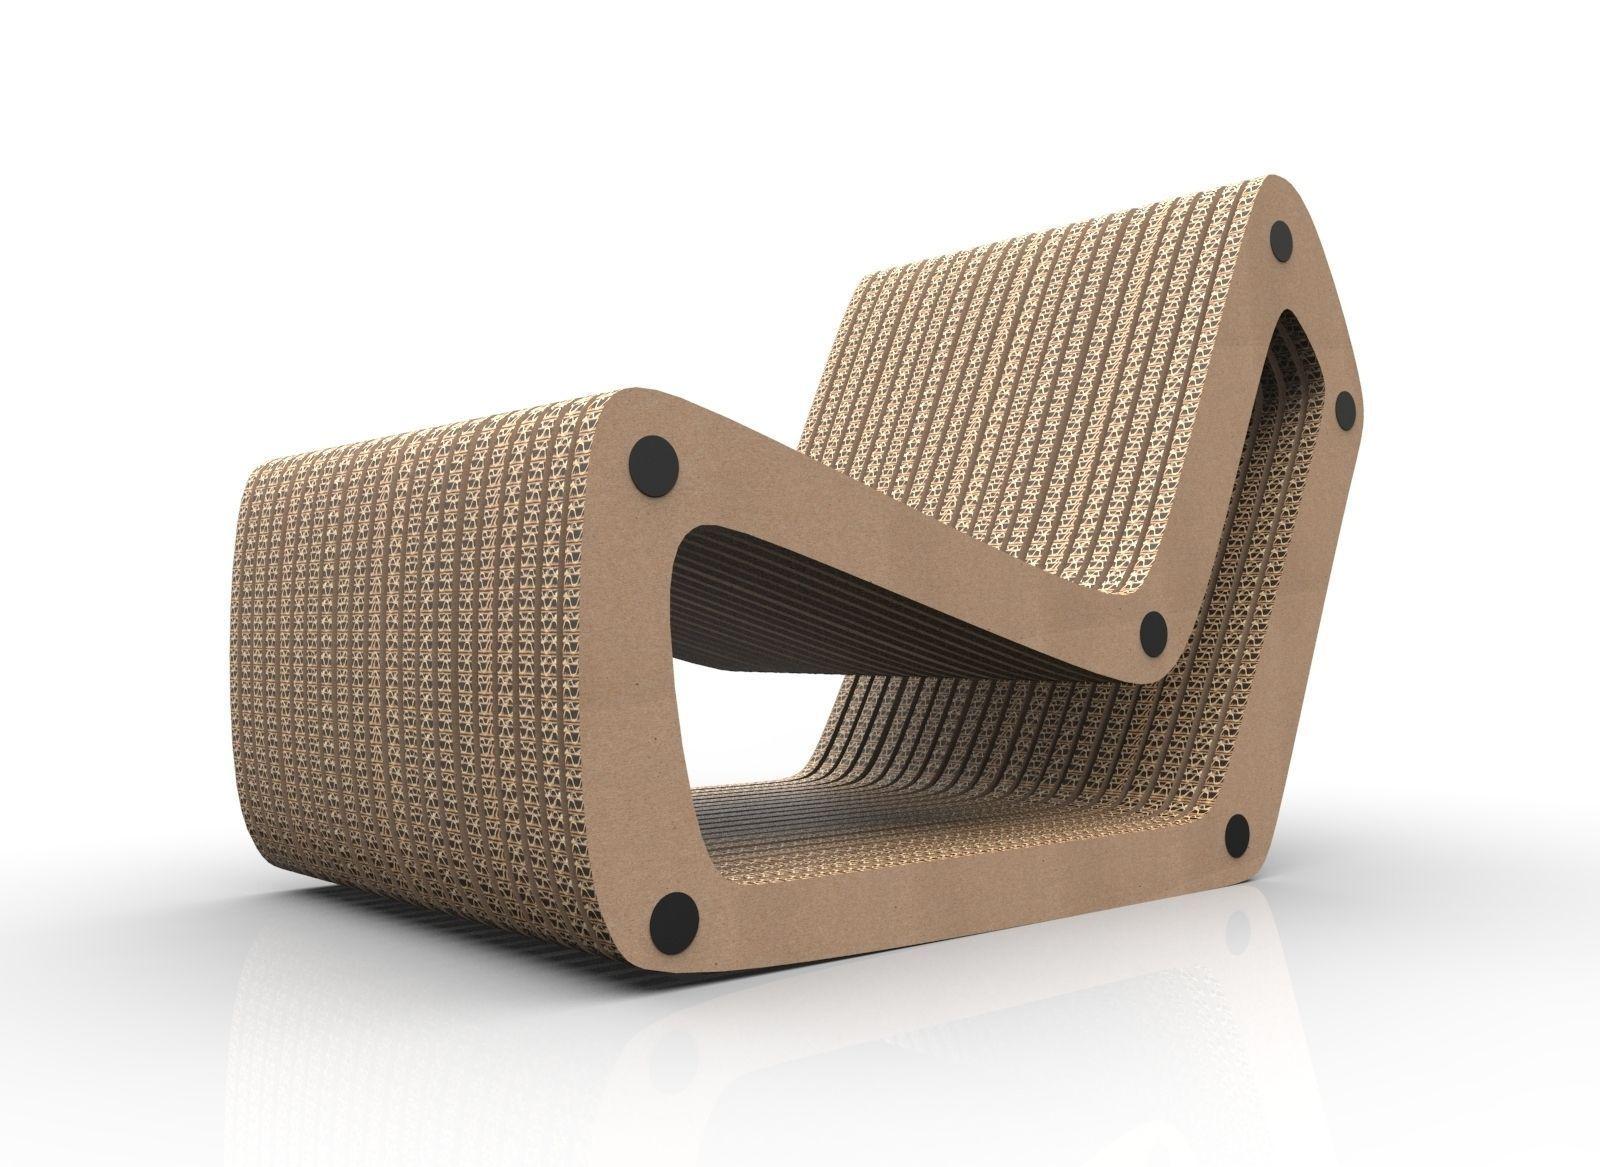 Cardboard Lounge chair 3D Model .3dm